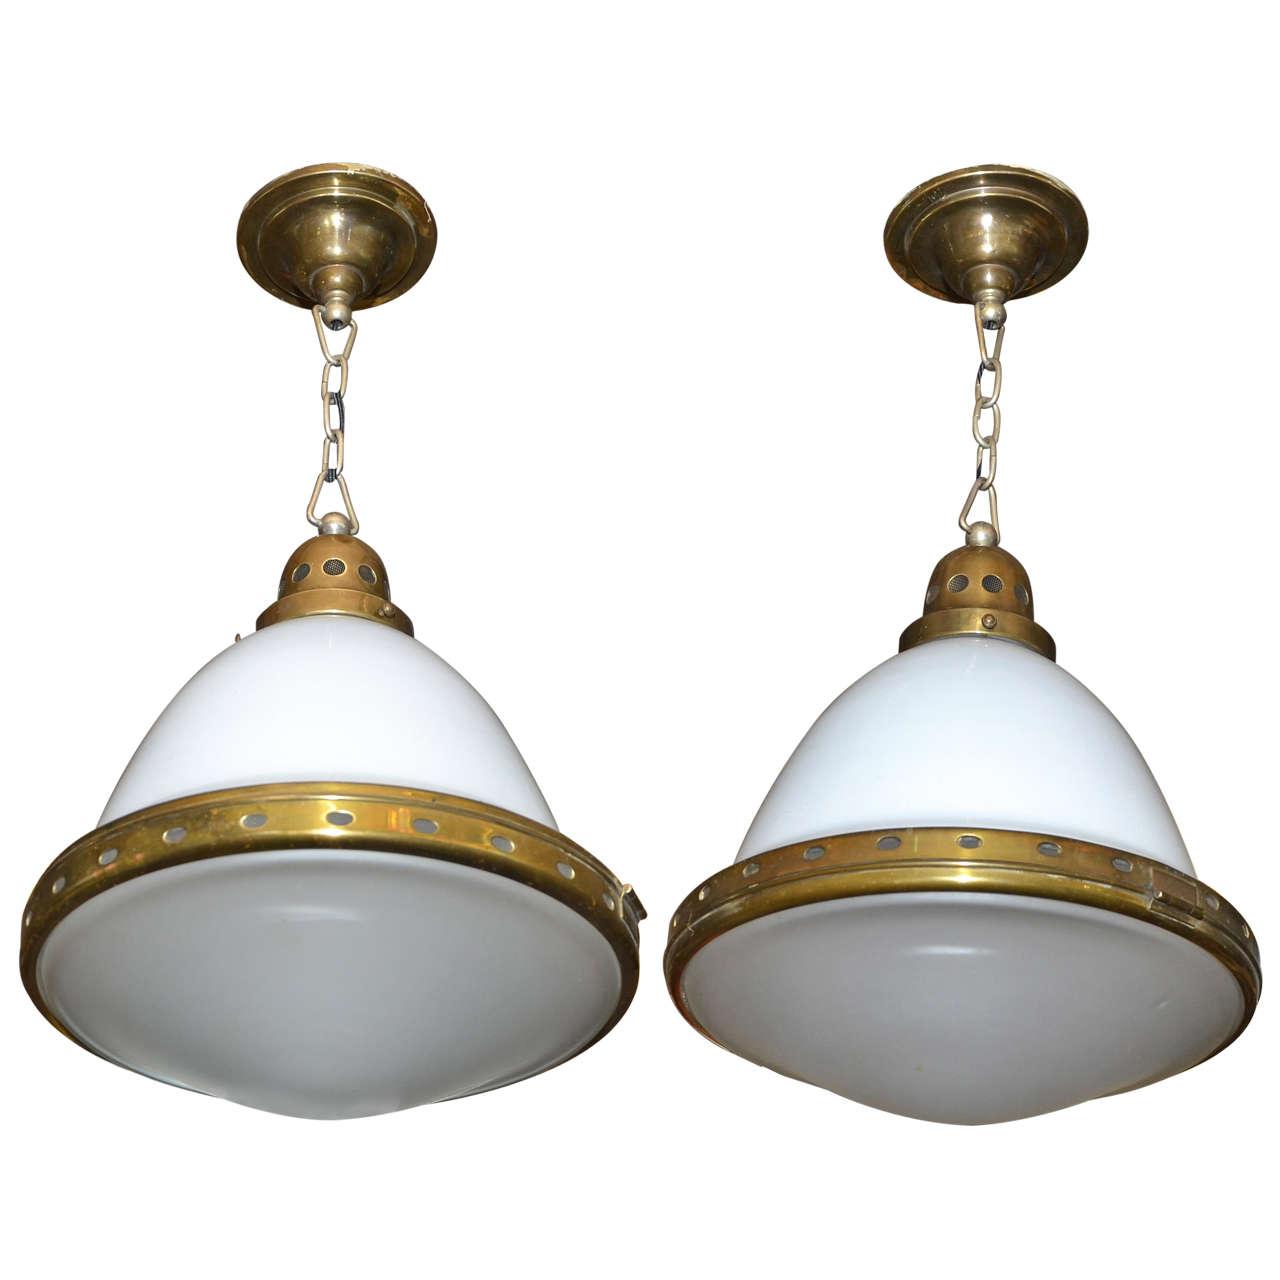 Pair Of Lanterns Lights Circa 1900 At 1stdibs